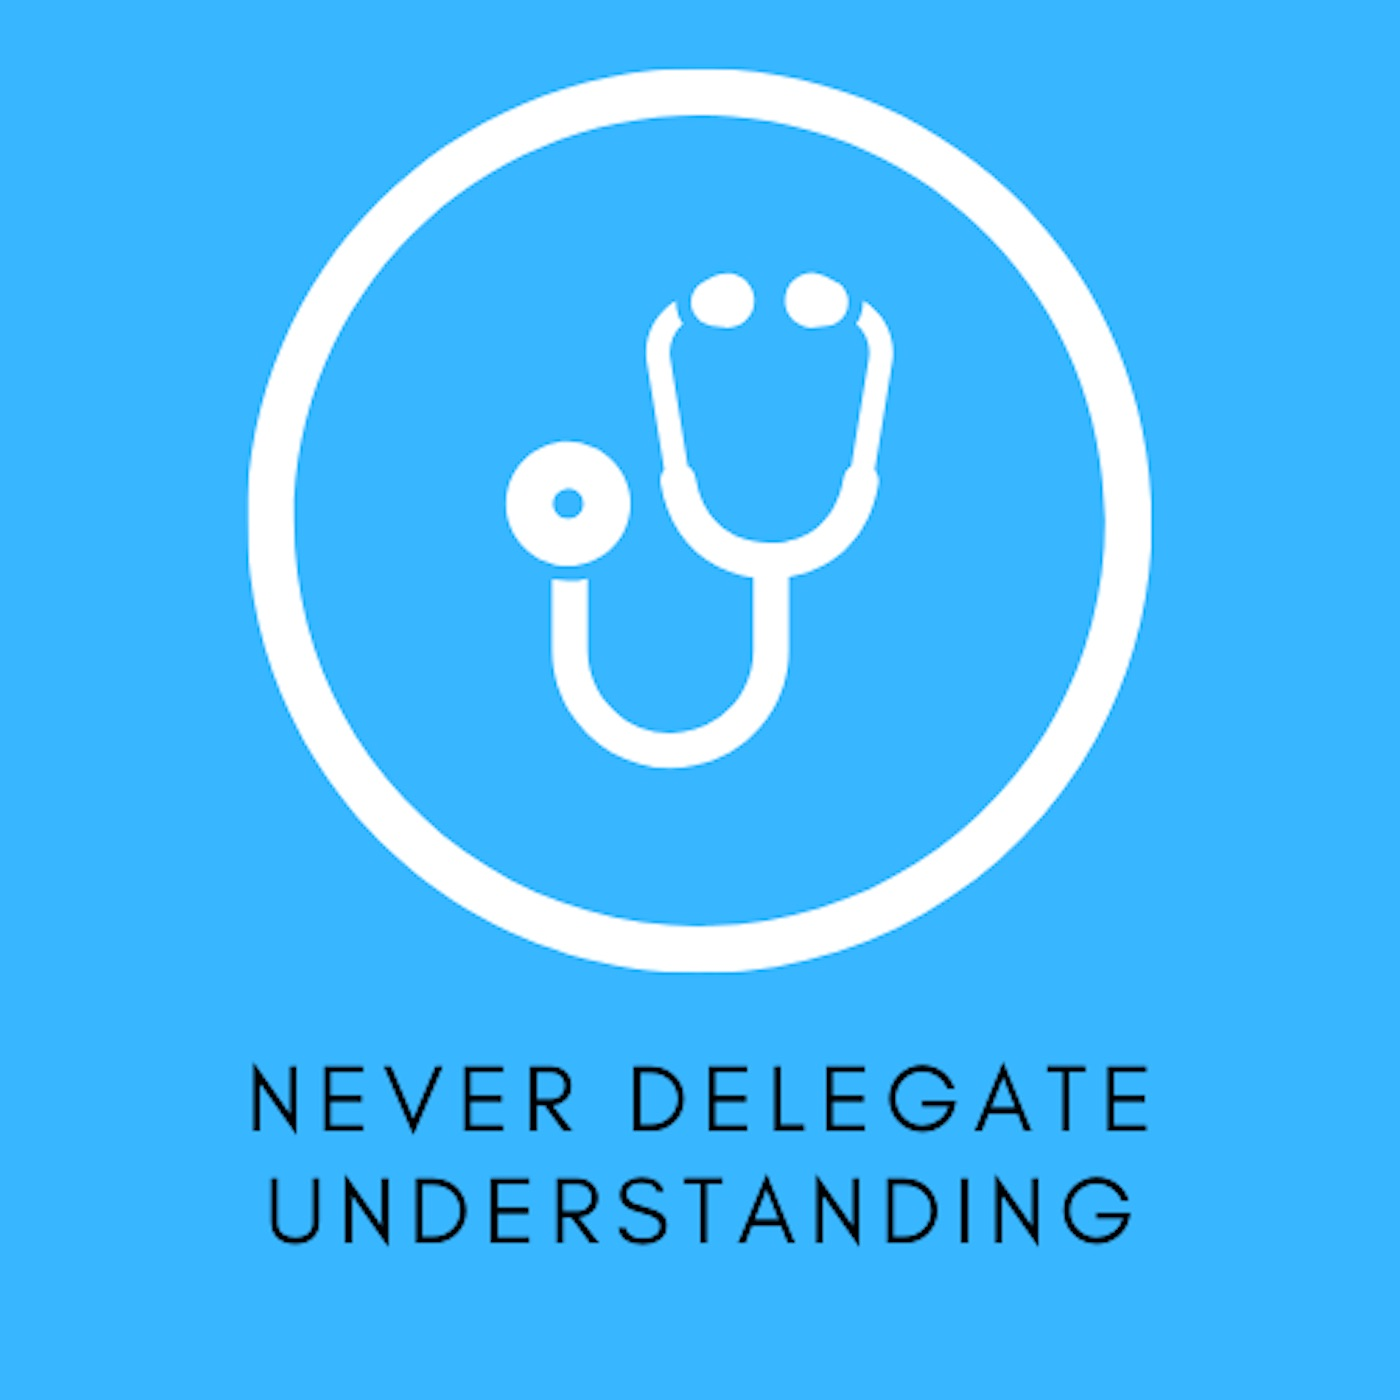 Never Delegate Understanding